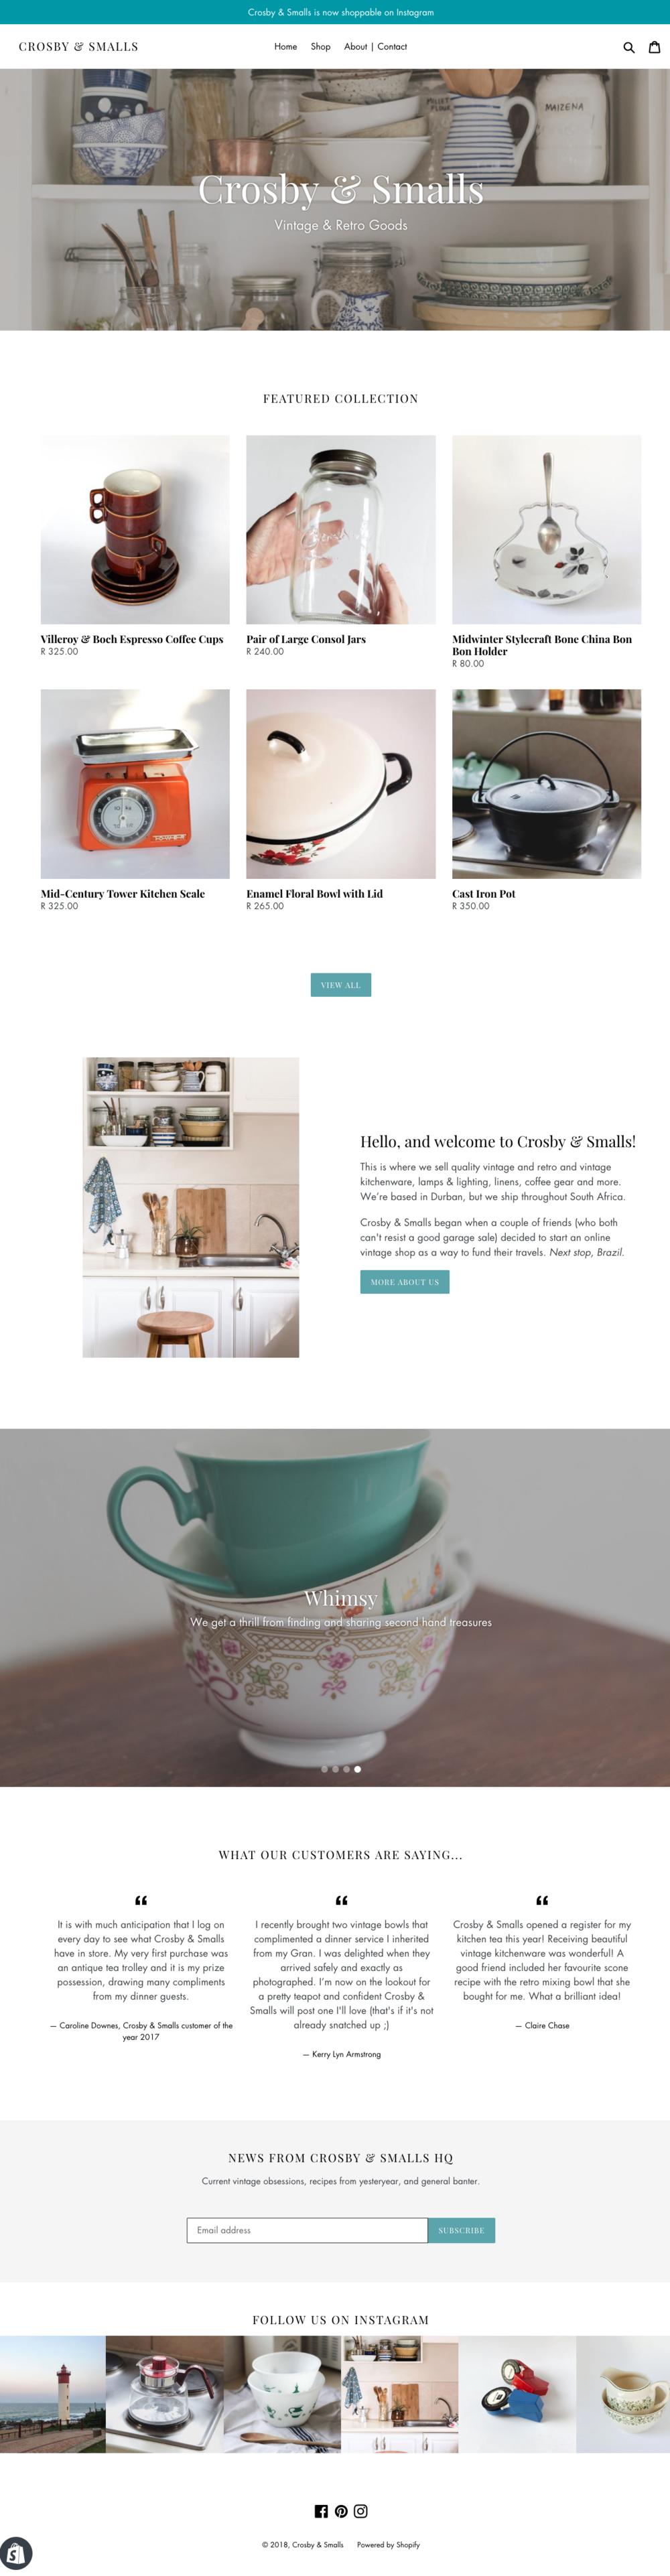 shopify-online-shop.png